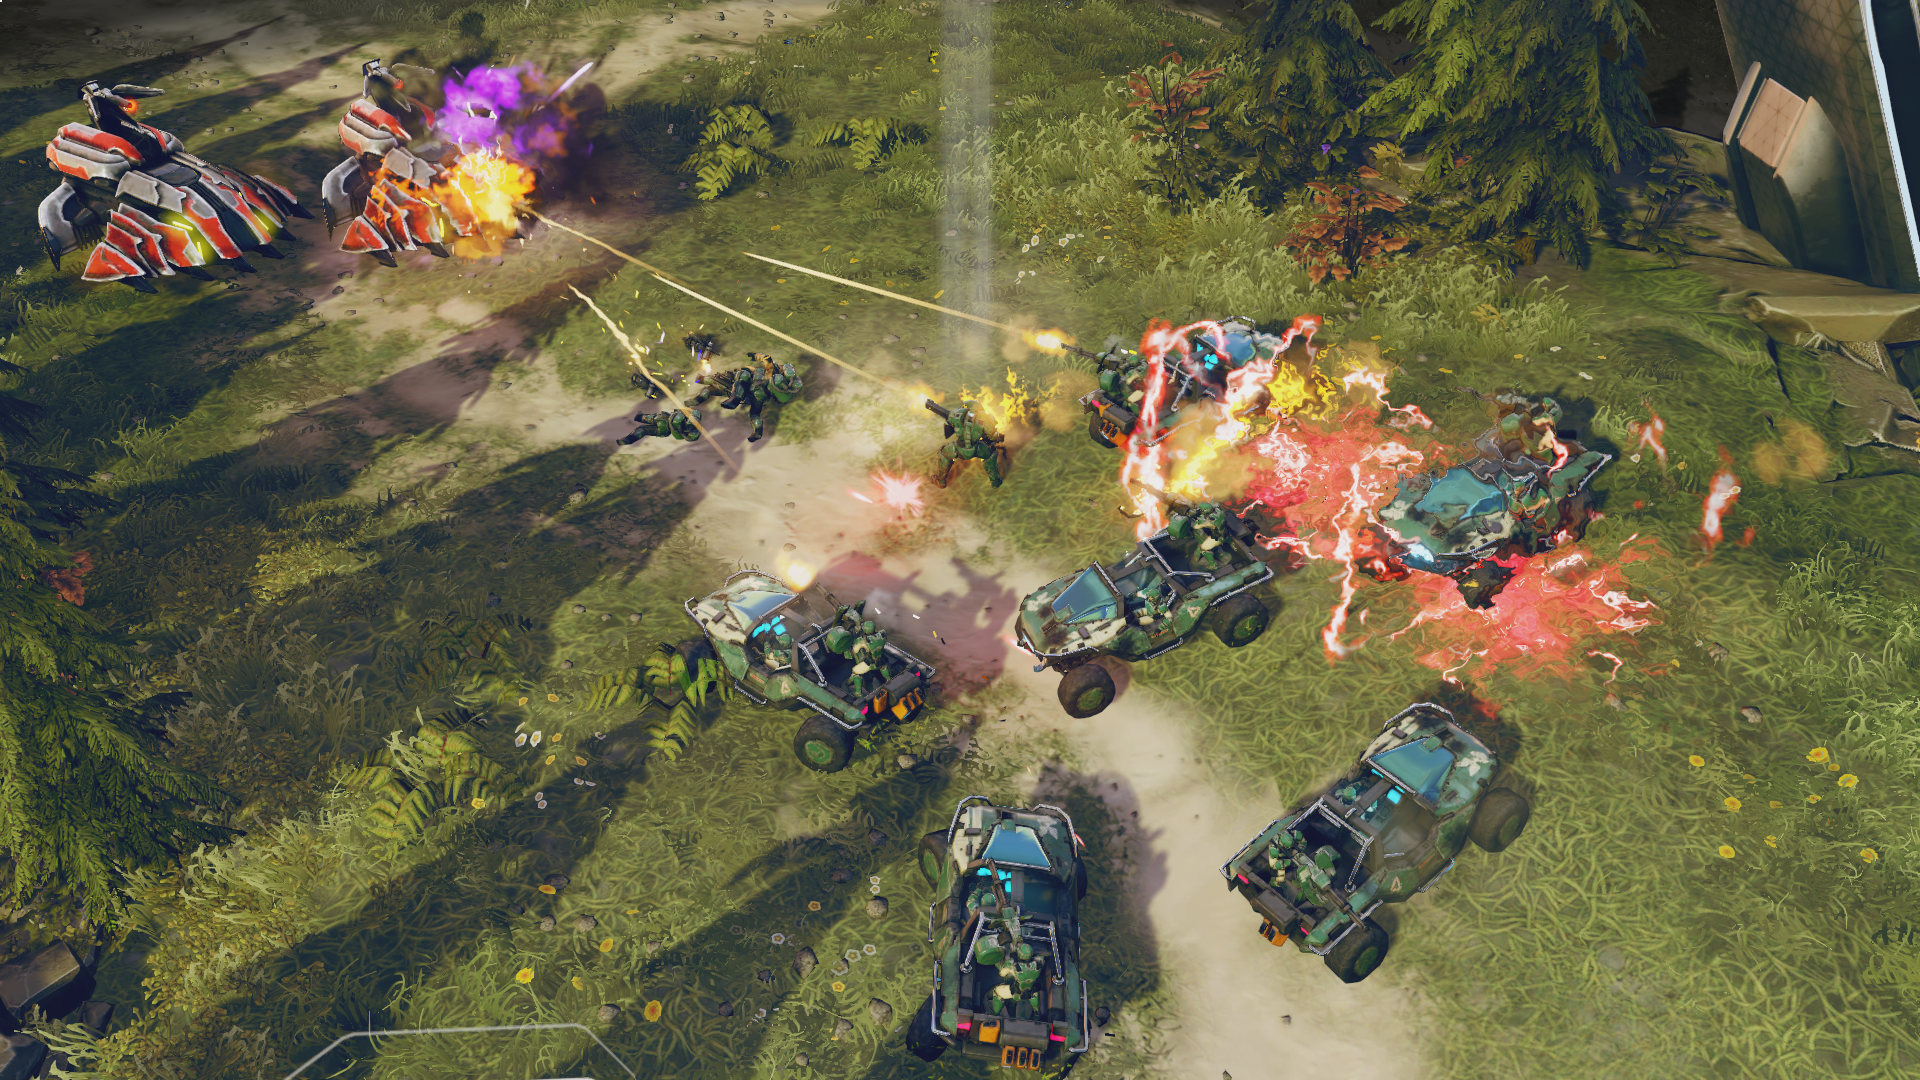 Halo Wars 2 Campaign One Three Zero Under Siege Halo Wars 2 Xbox One Review